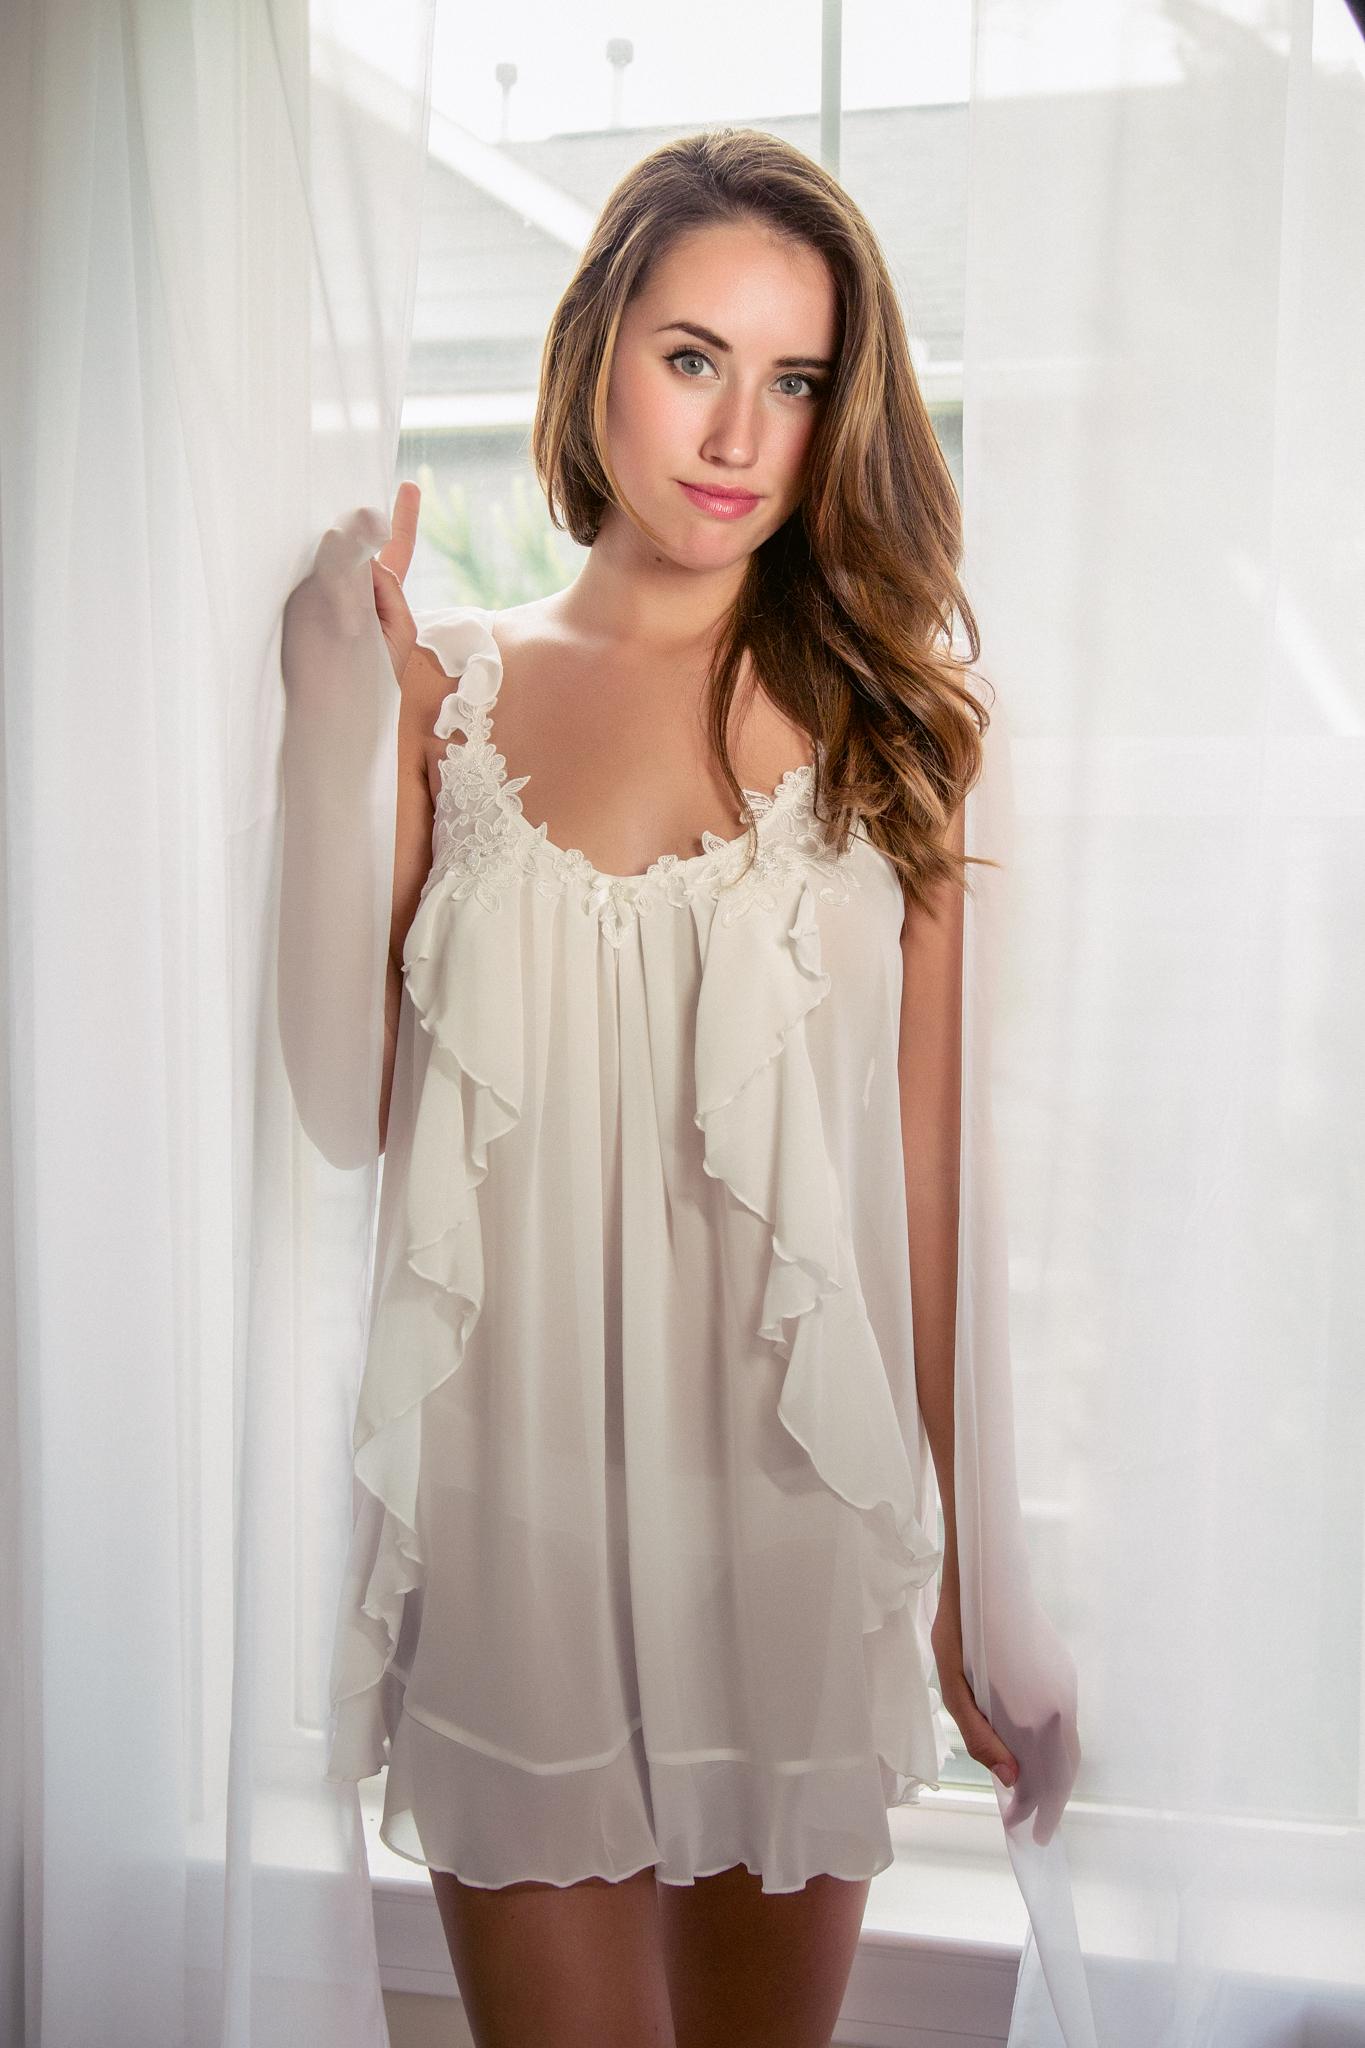 Gorgeous white bridal lingerie boudoir shoot by Boudoir by Marie in Charleston, SC.